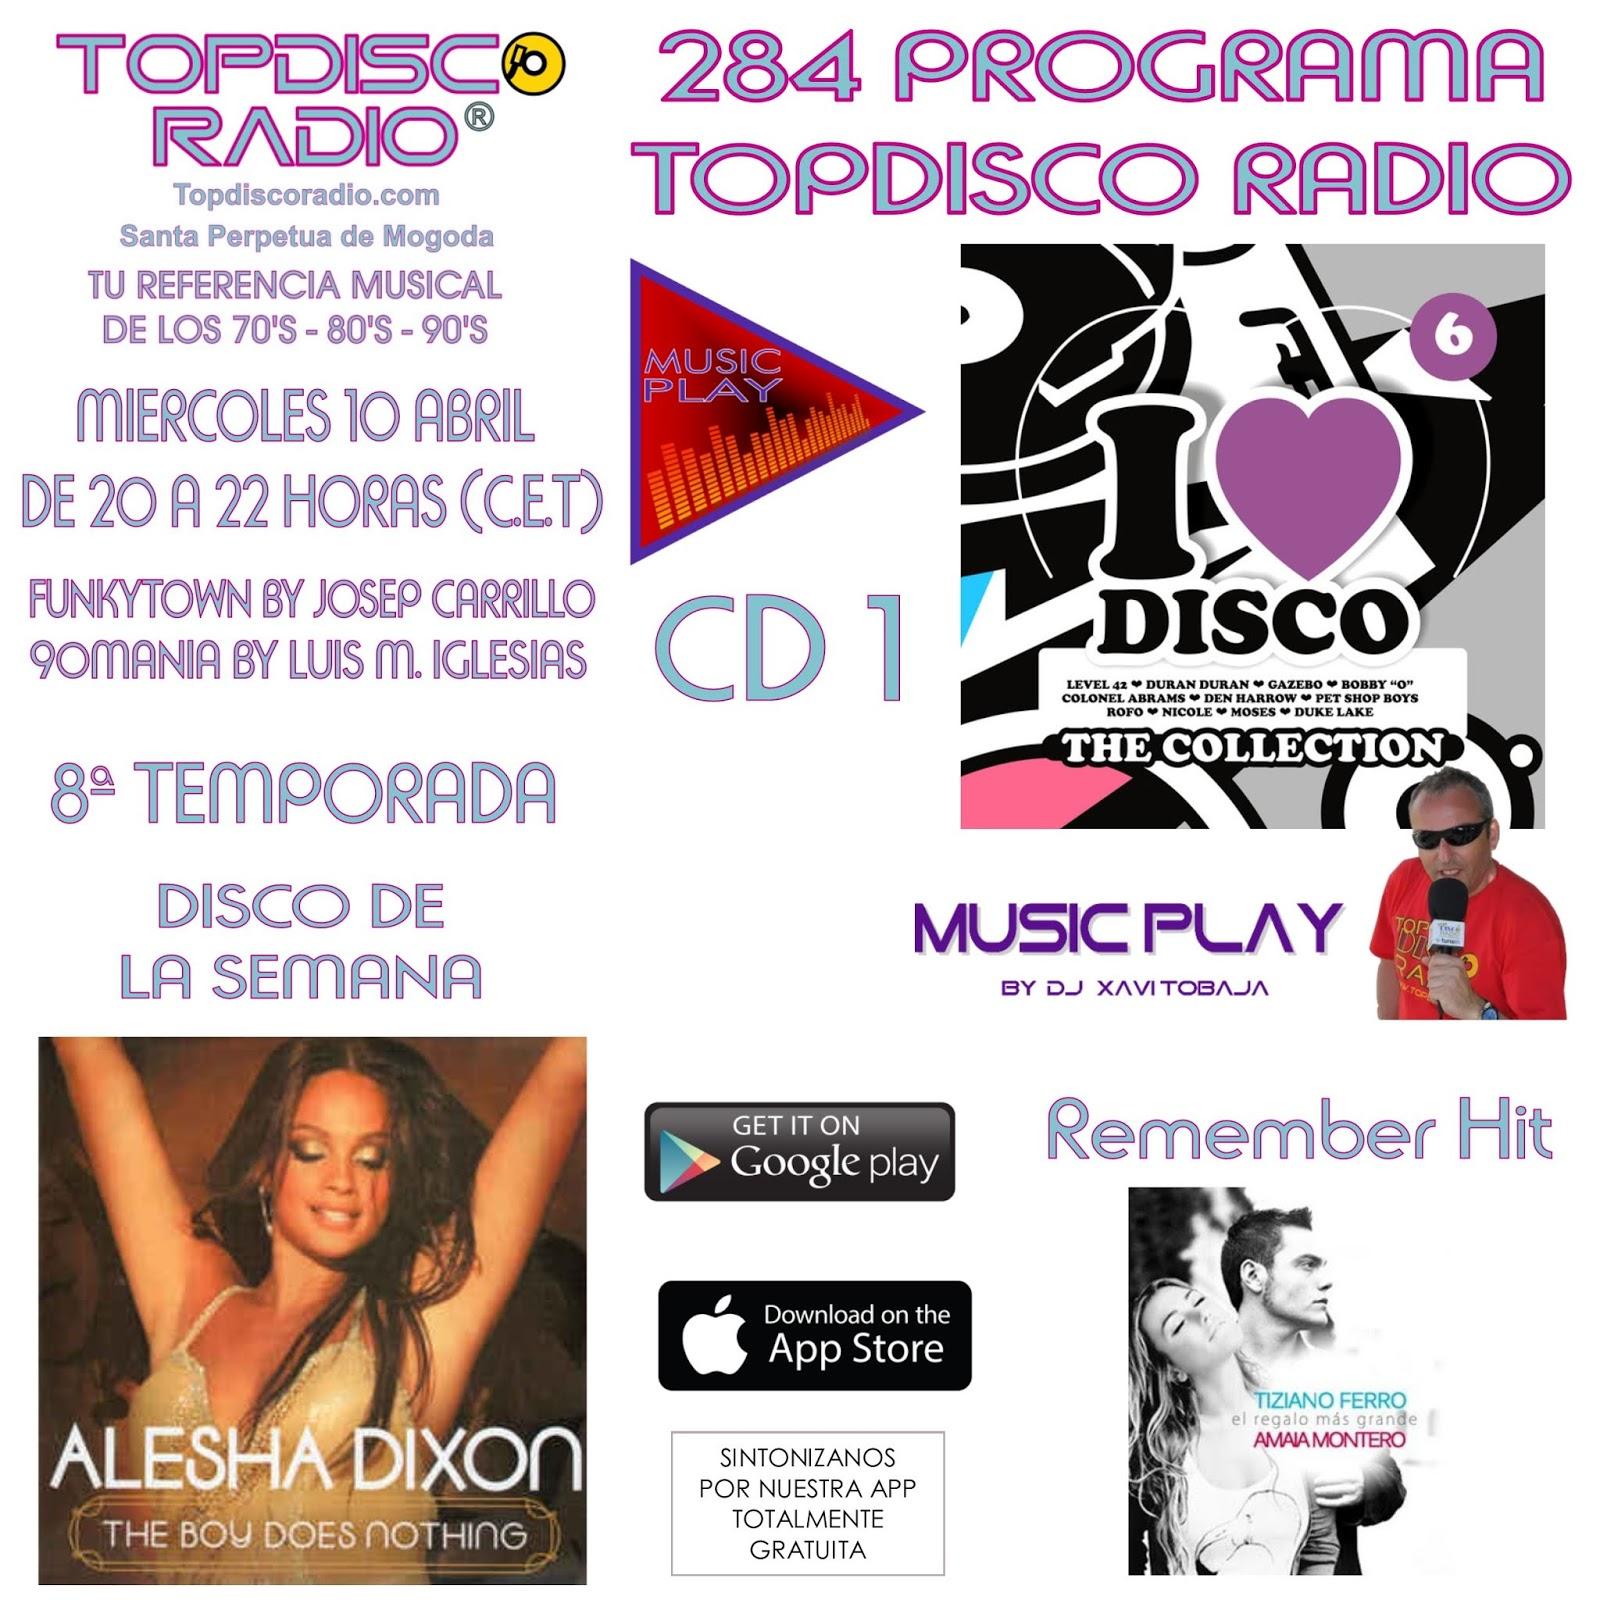 284 Programa Topdisco Radio